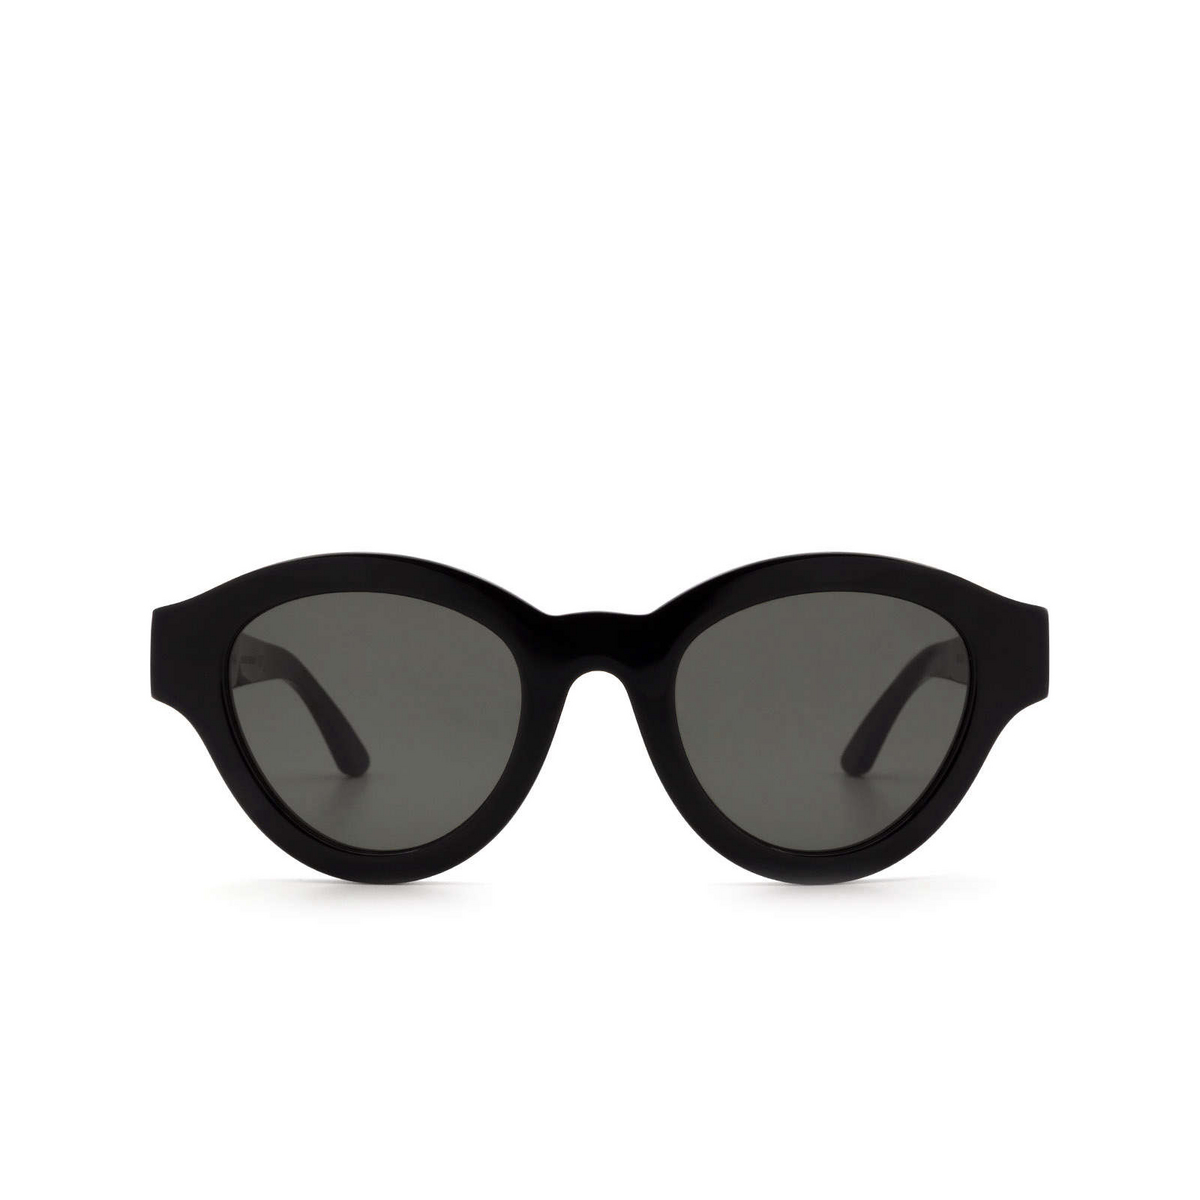 Huma® Cat-eye Sunglasses: Dug color Black 06 - front view.